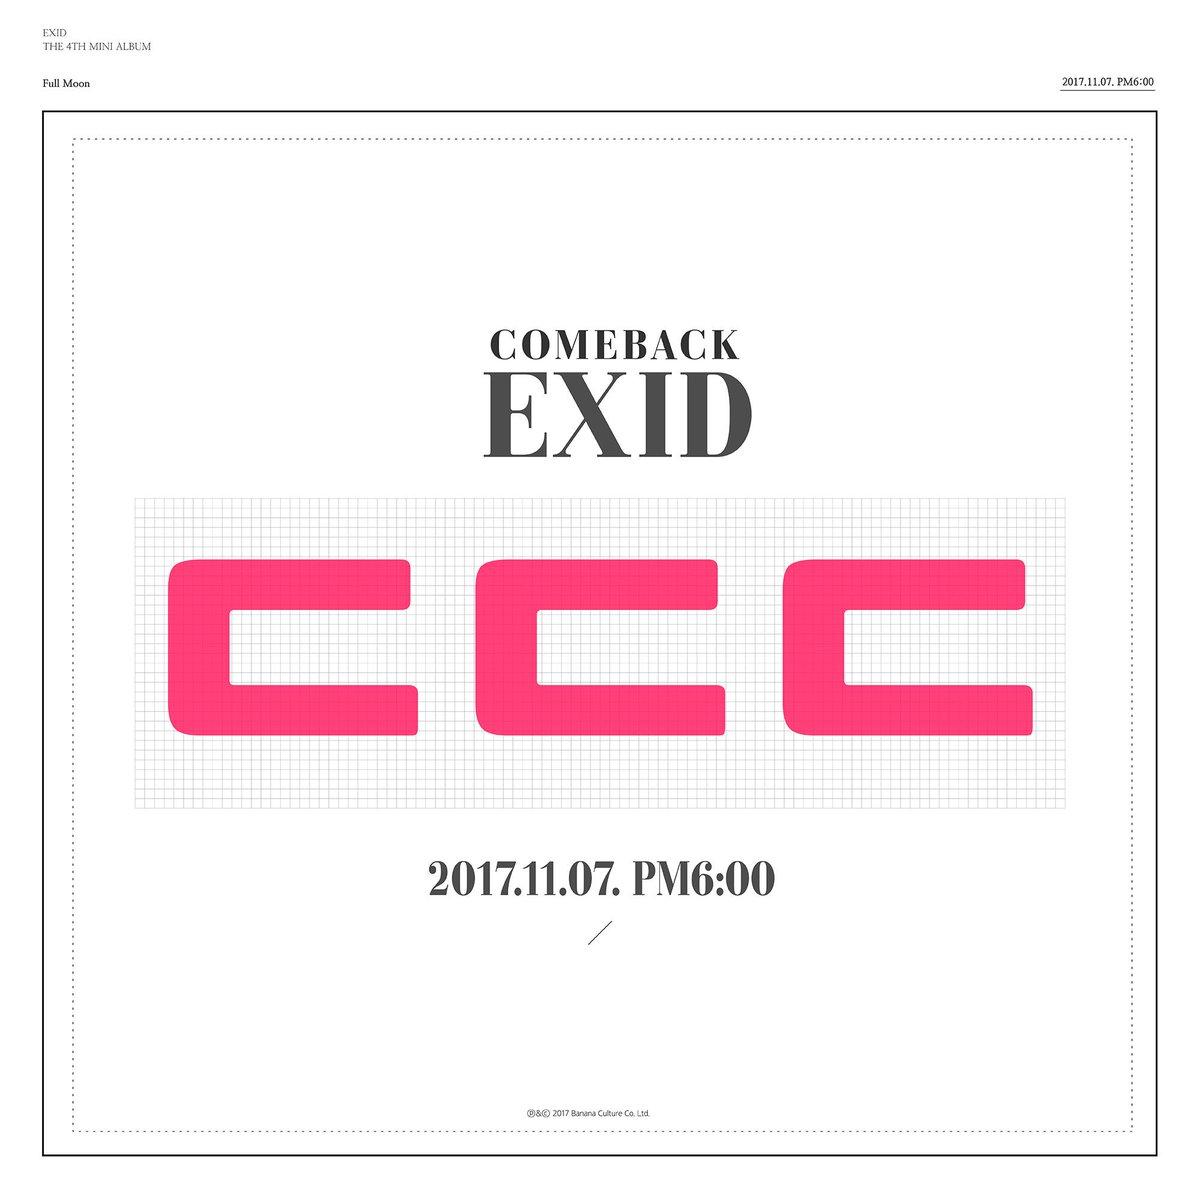 [#EXID] EXID 4TH MINI ALBUM [#FullMoon] TITLE SPOILER #3 2017.11.07 PM 06:00  #ㄷㄷㄷ #Title #Spoiler #스포 #컴백 #Comeback <br>http://pic.twitter.com/r8KtXWK6hB